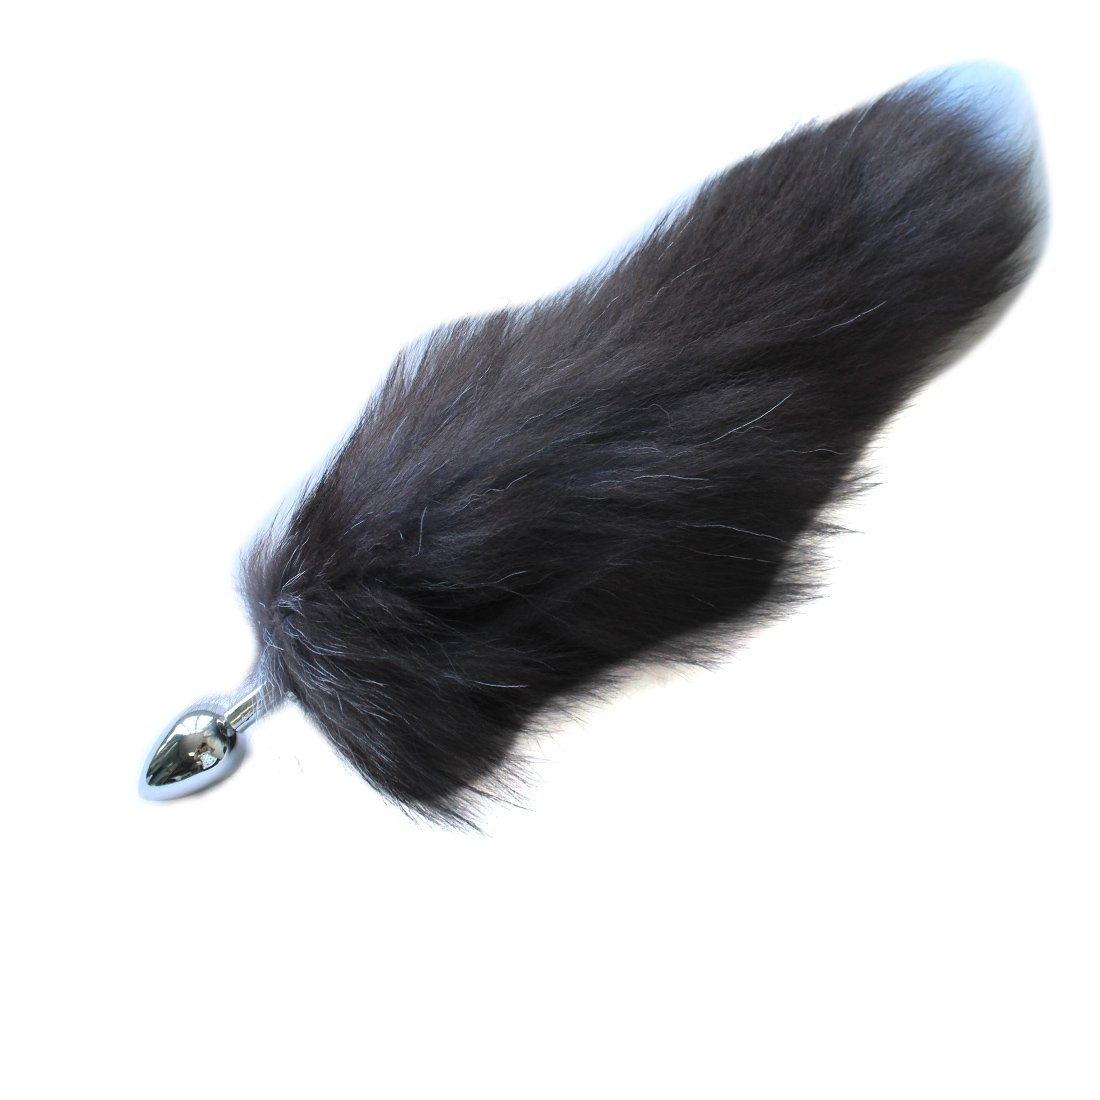 ass plug tail Amazon.com: iEFiEL Animal Anal Cram Costume Metal Butt Fox Tail Plug  (Black): Health & Personal Care